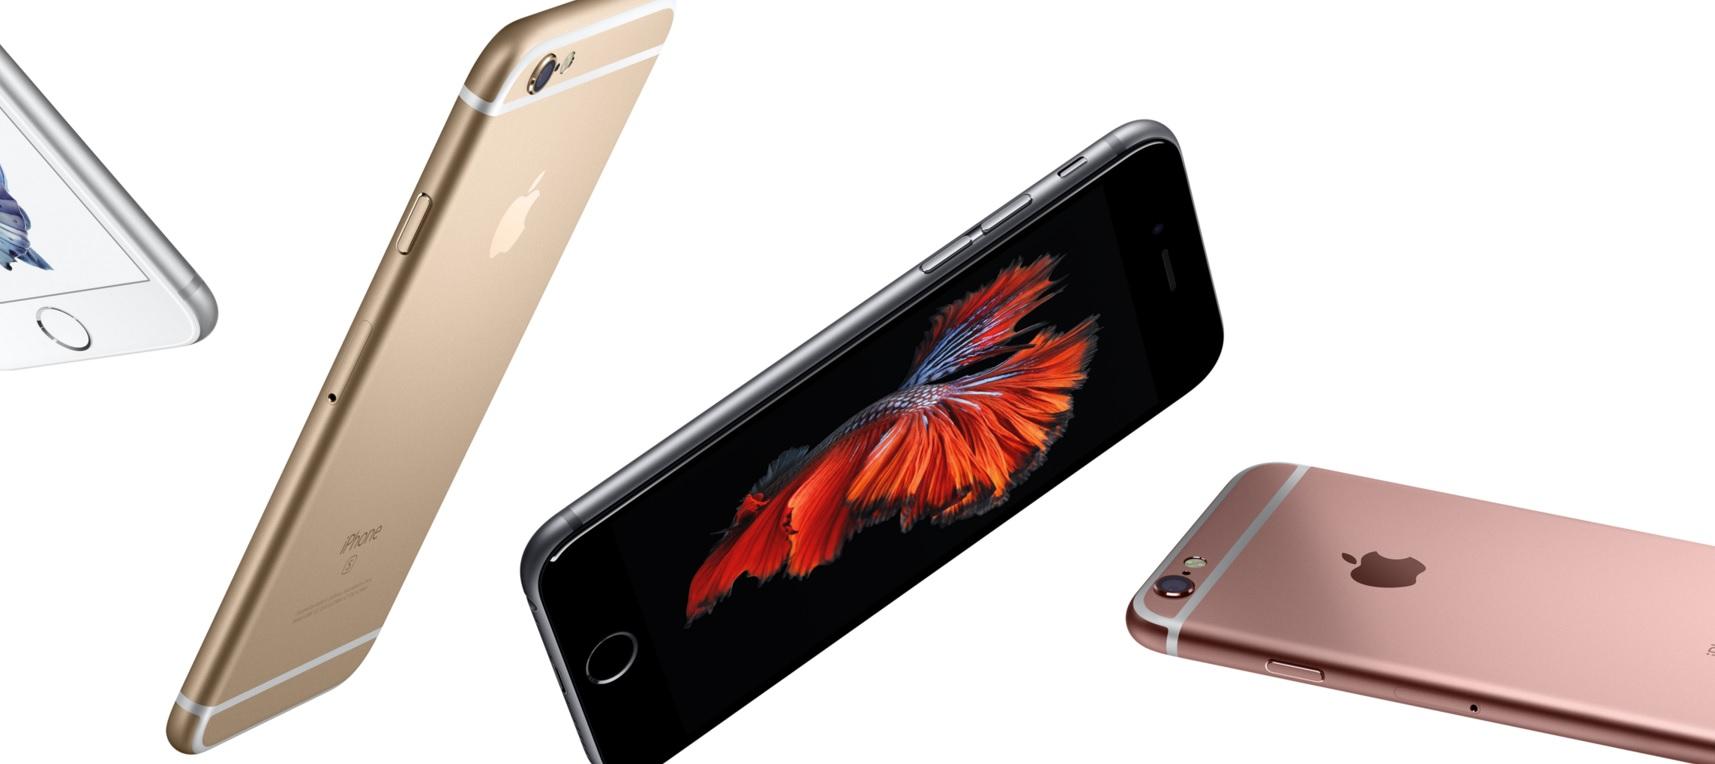 Apple har sluppet OS X beta 5 og iOS beta 5.